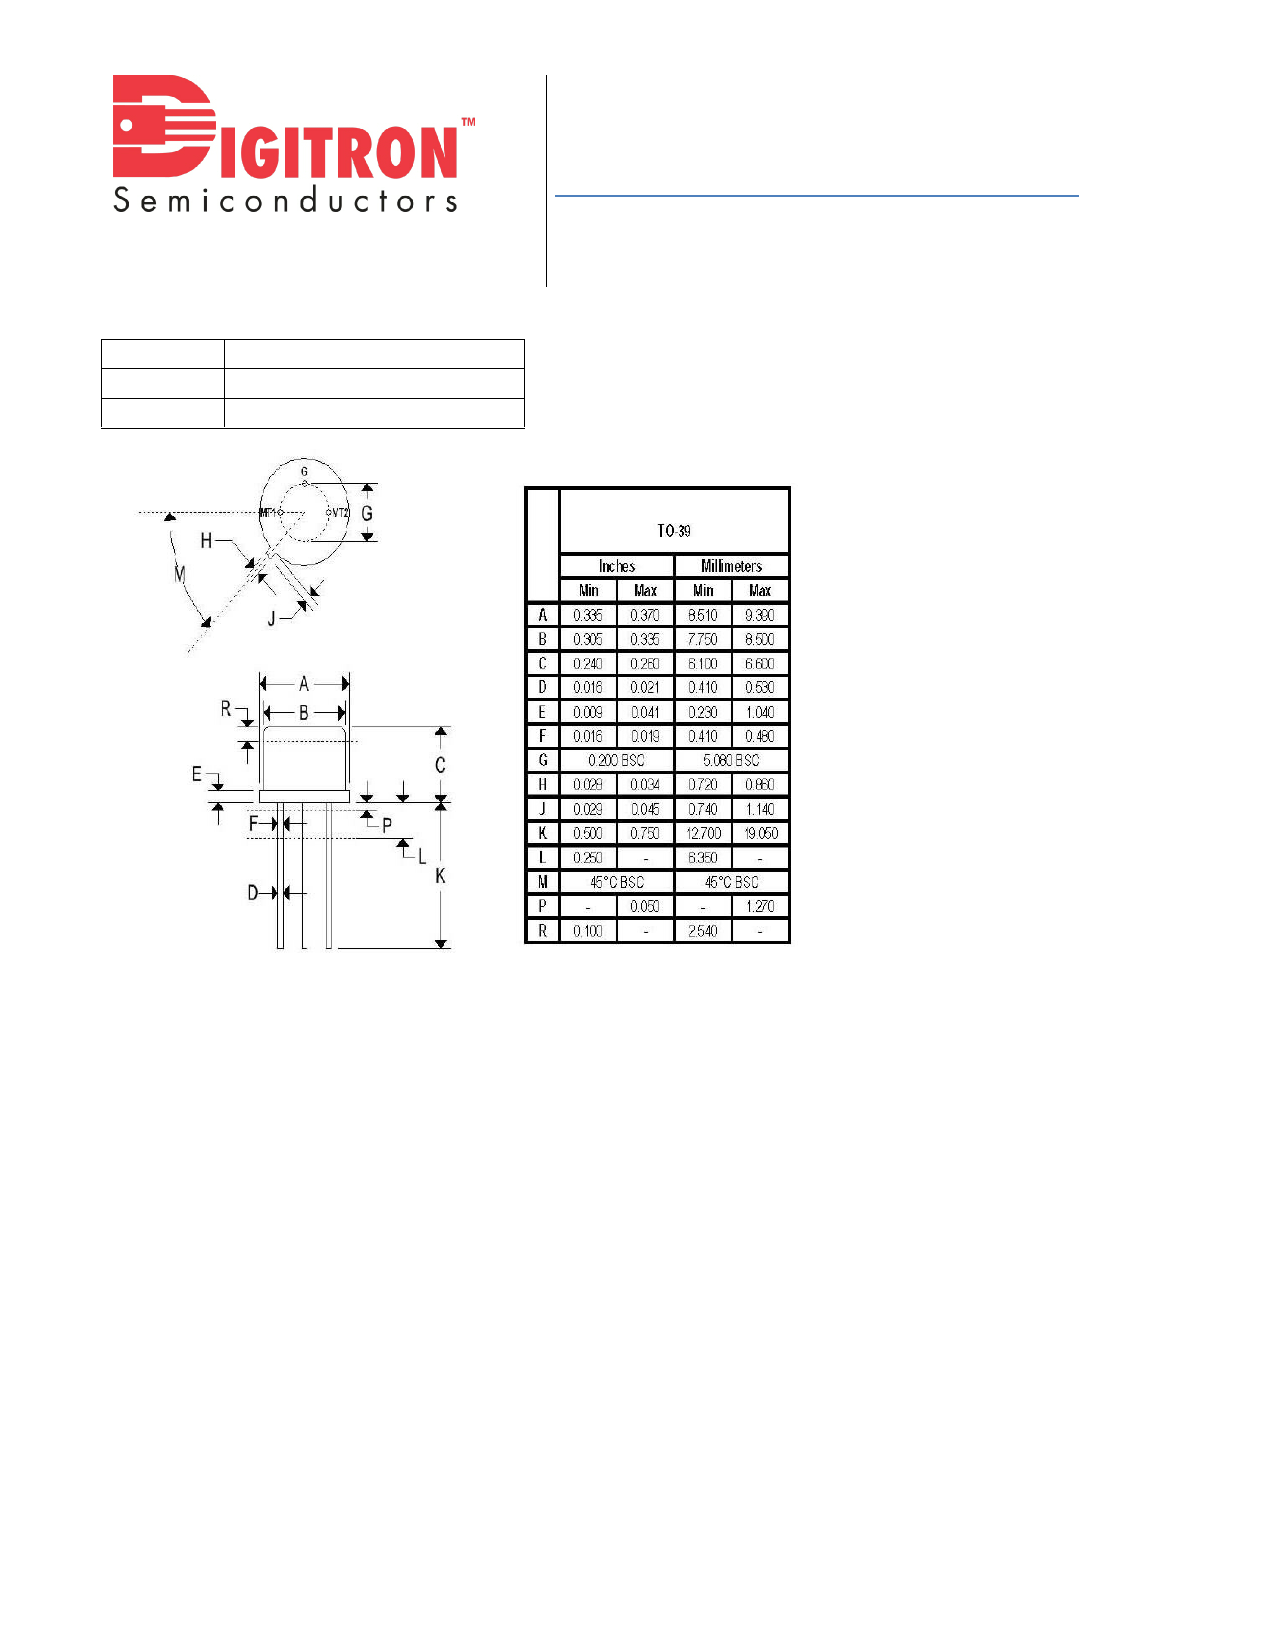 2N1595 pdf, equivalent, schematic